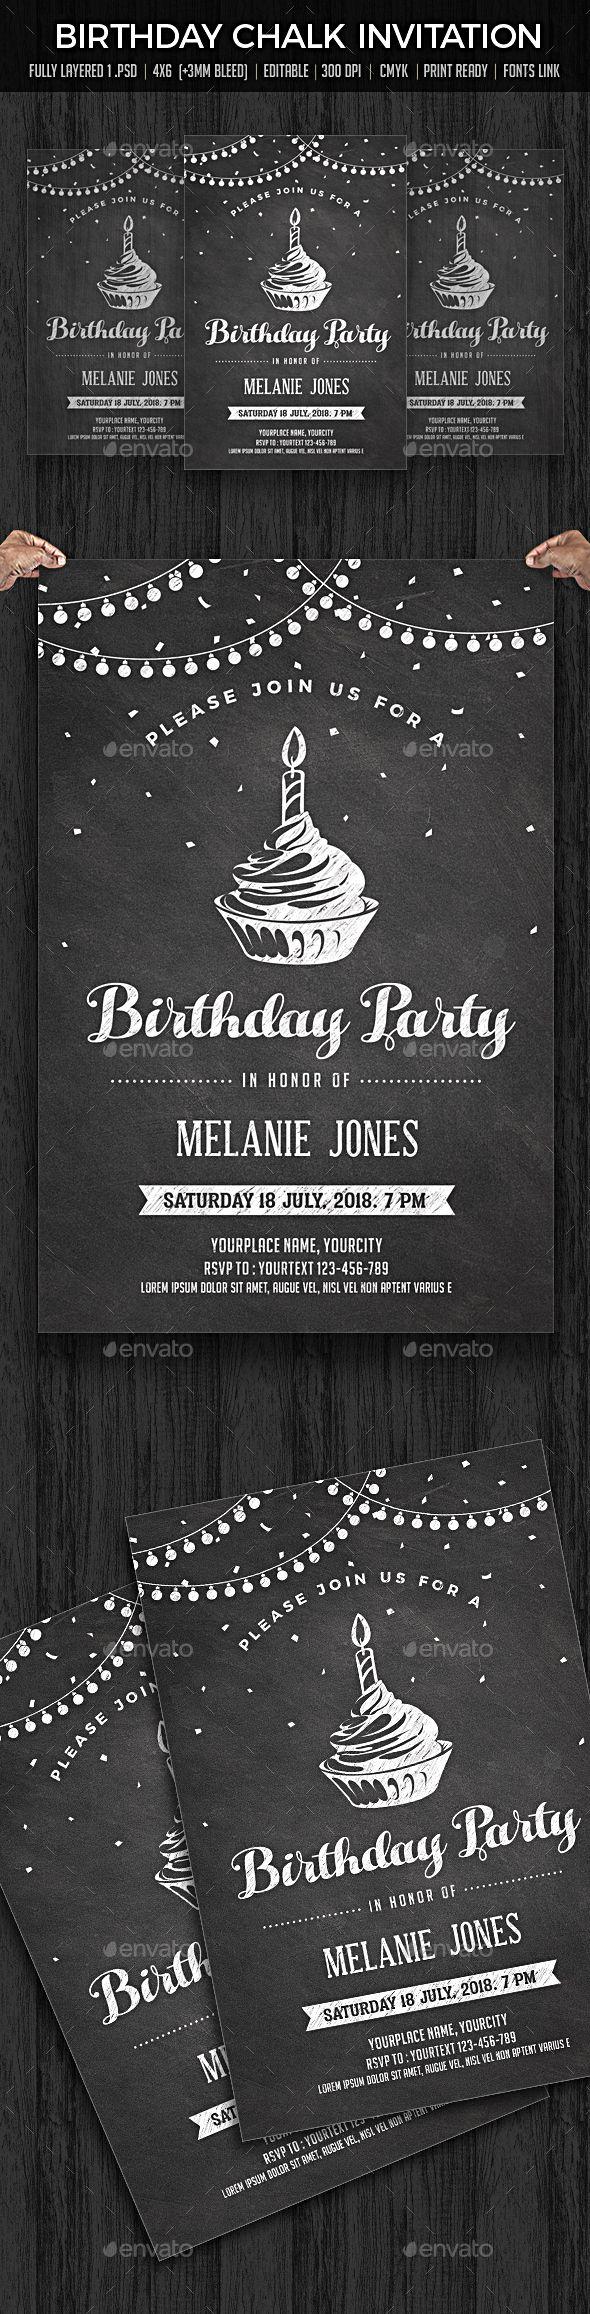 7 best Birthday Invitation Templates images – Buy Birthday Invitations